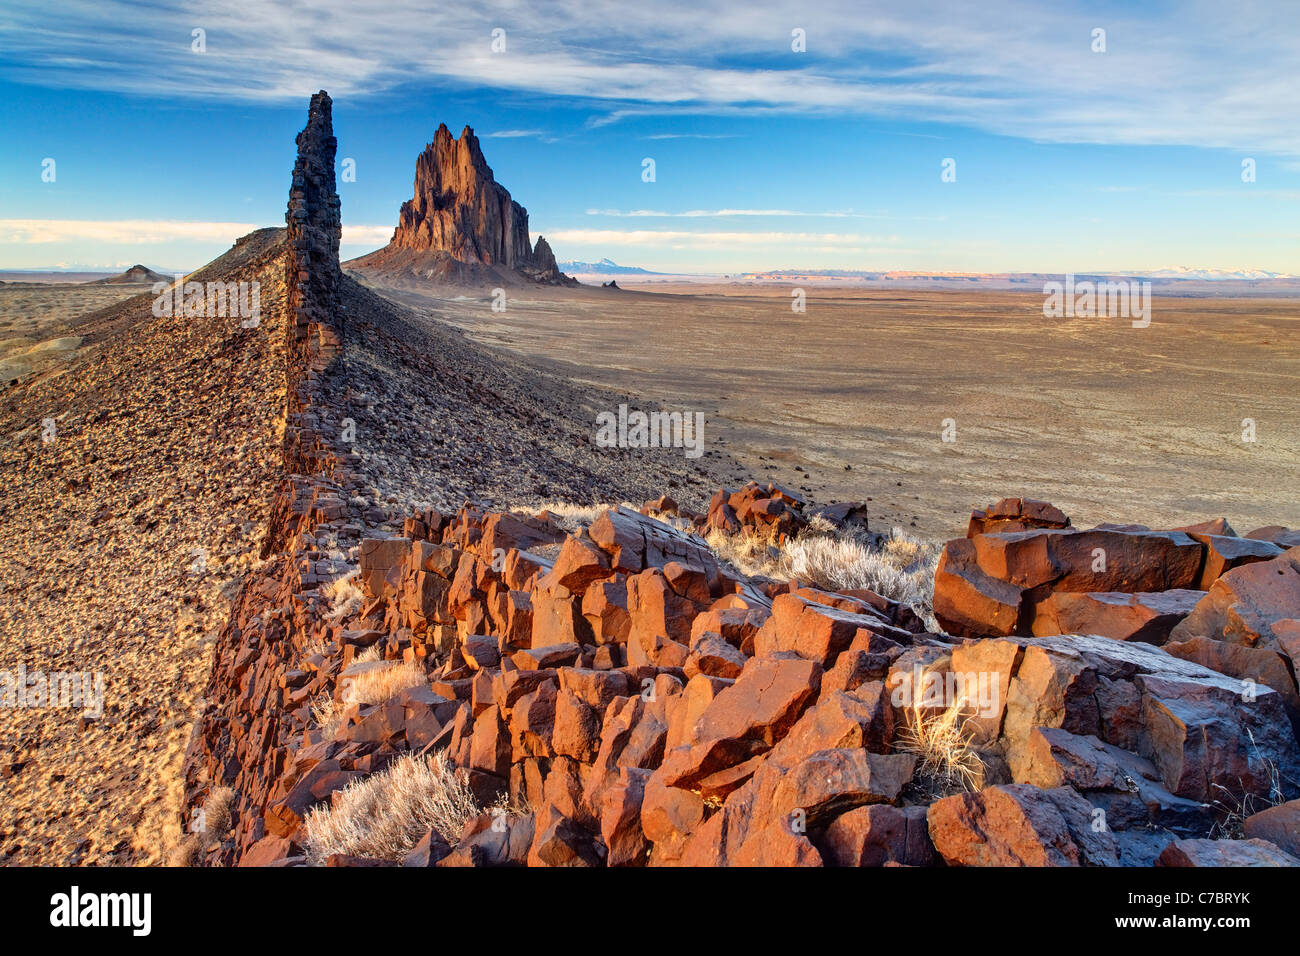 Shiprock Rock and black dike ridge, New Mexico, USA - Stock Image